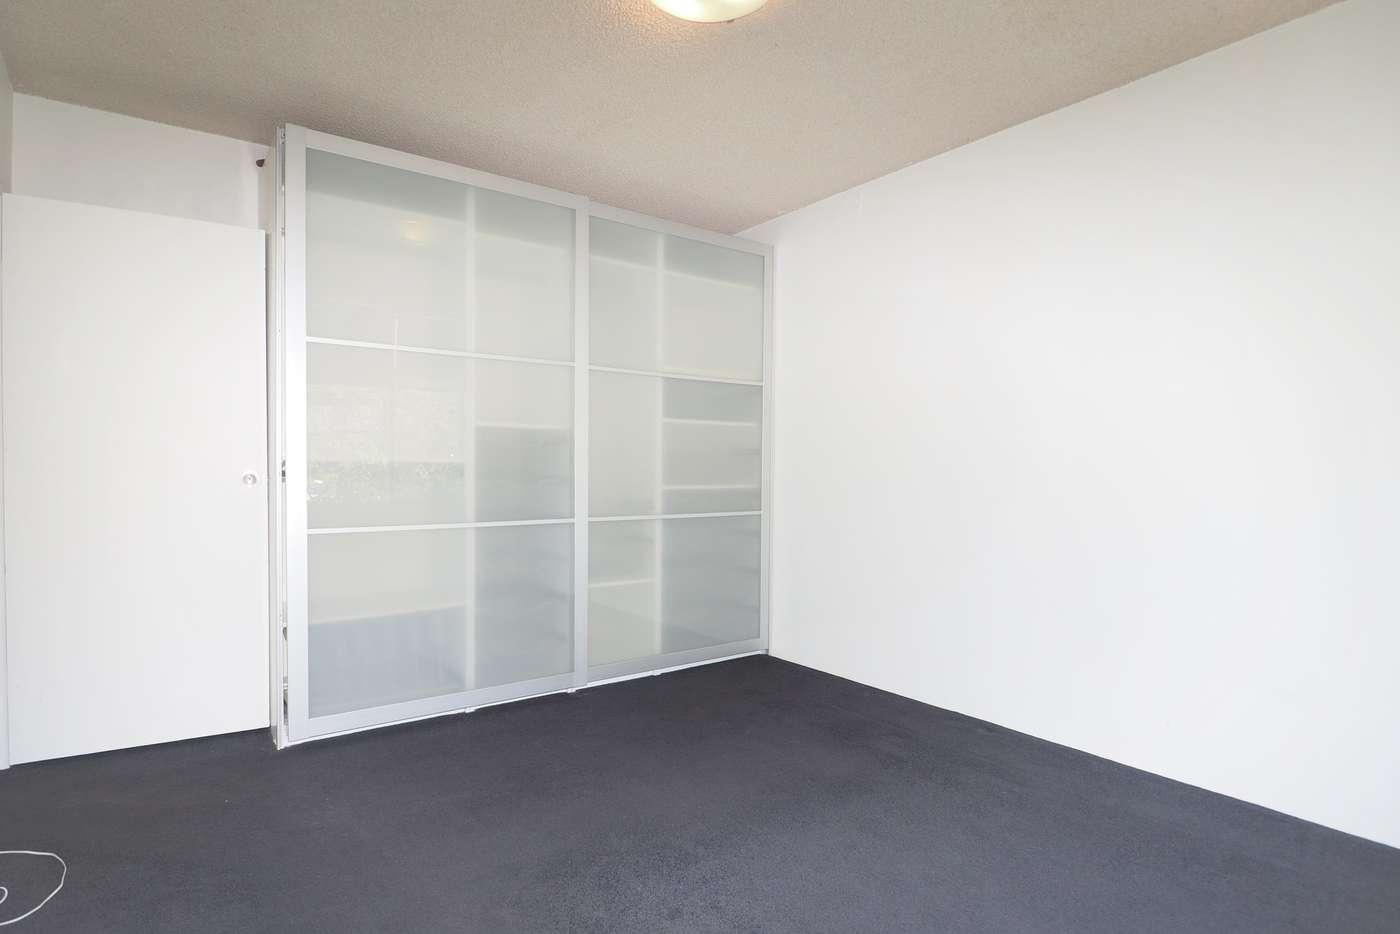 Fifth view of Homely apartment listing, 3/186 Raglan Street, Mosman NSW 2088